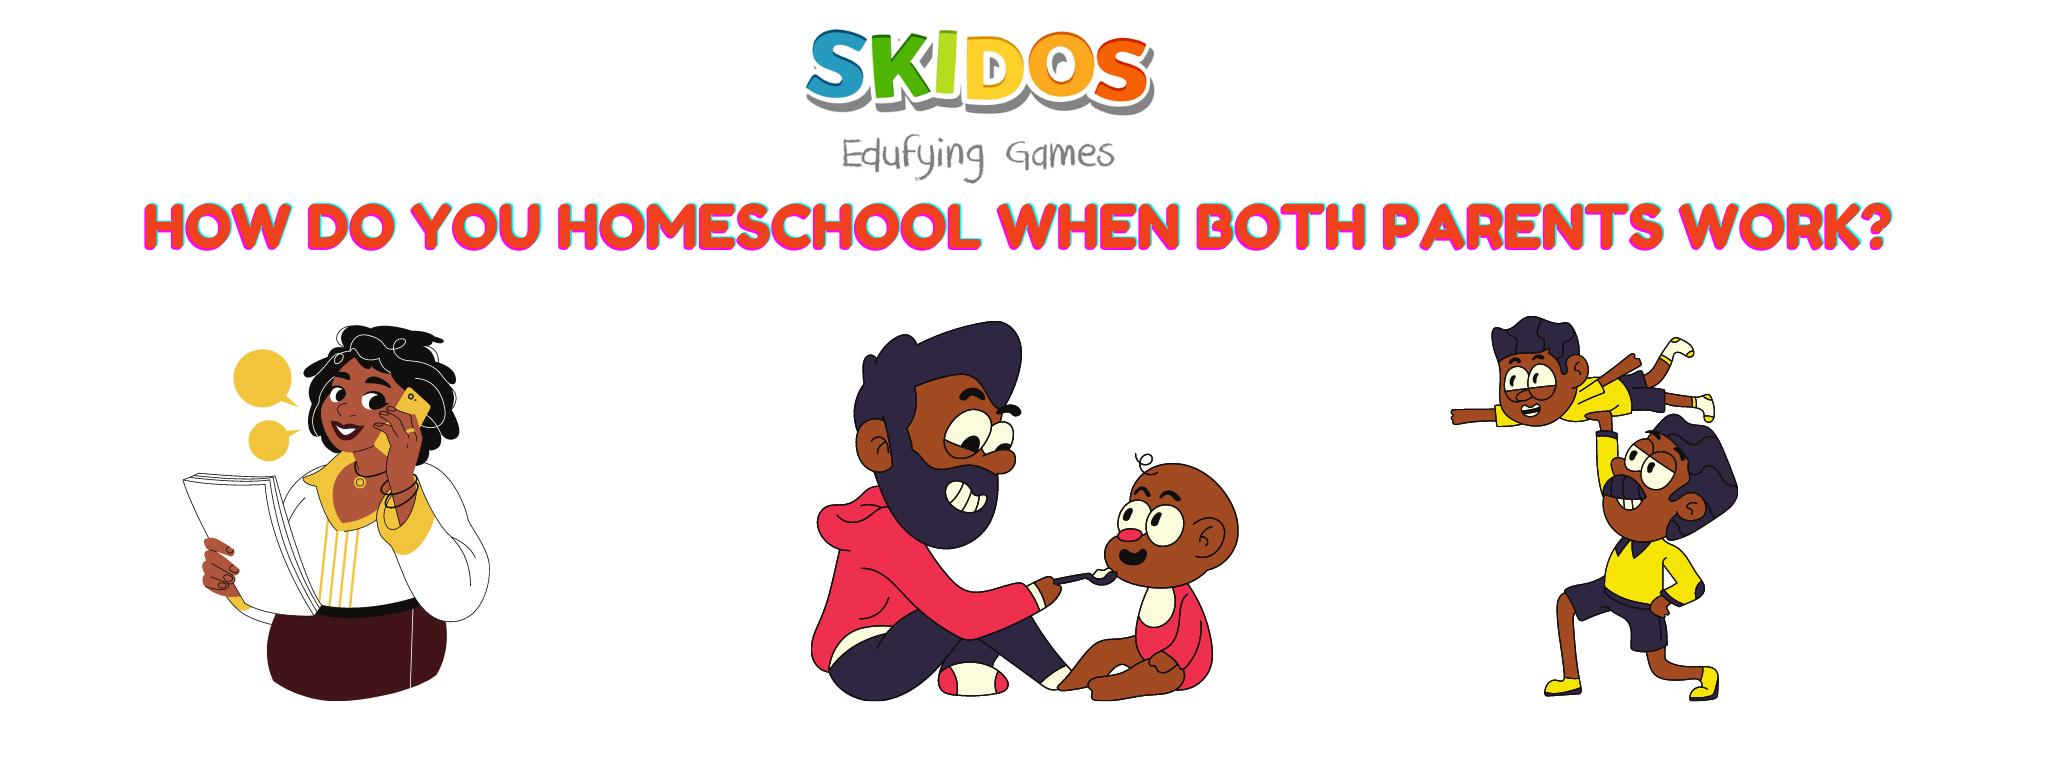 How do you homeschool when both parents work